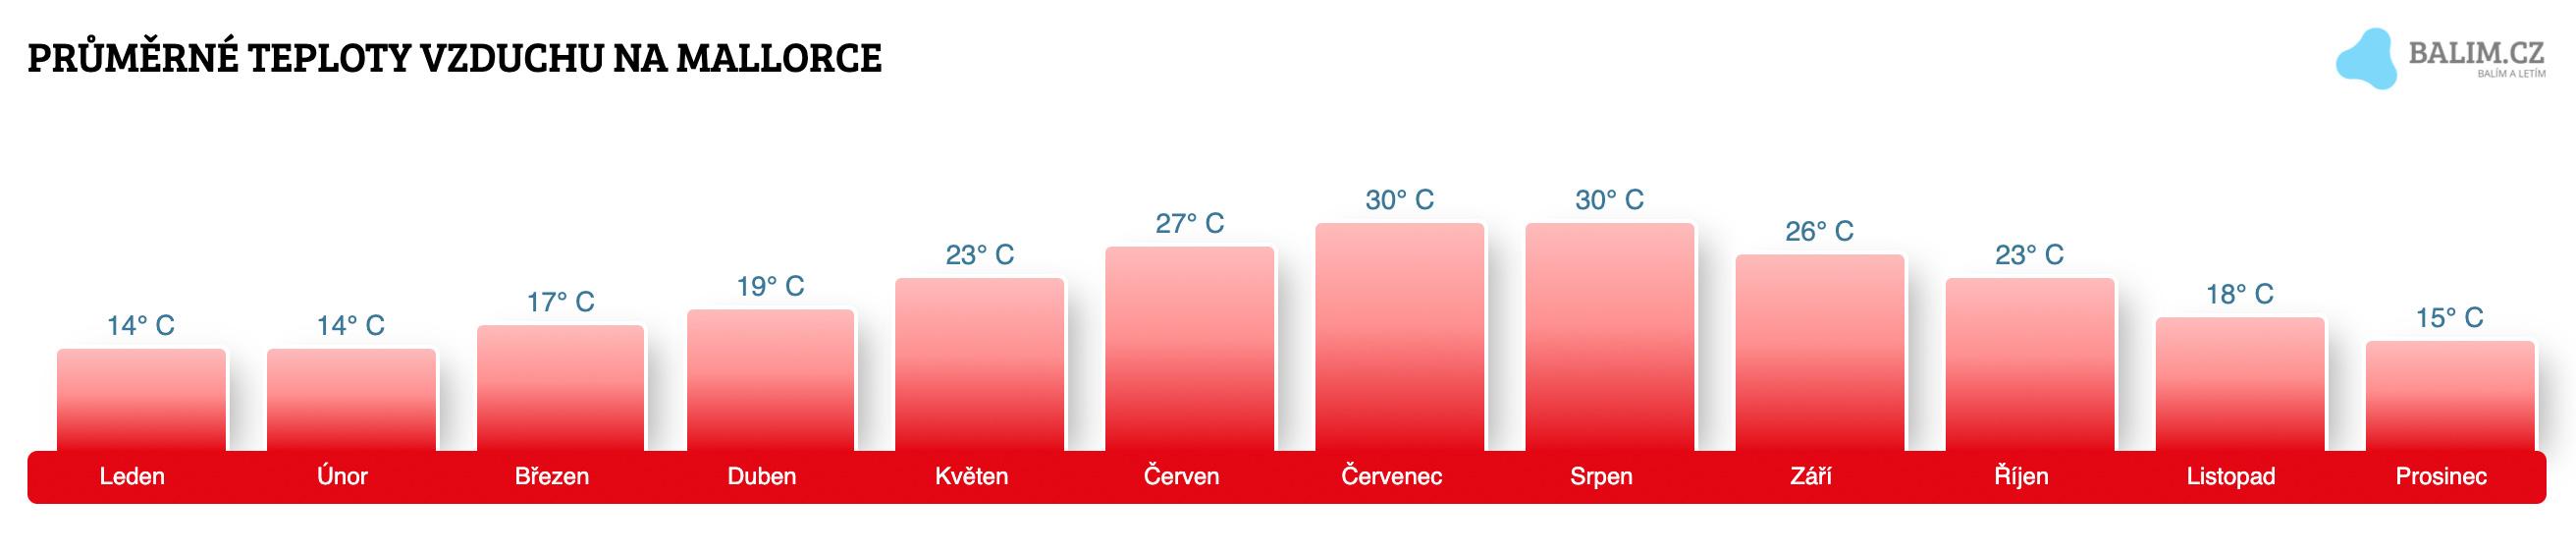 počasí mallorca říjen